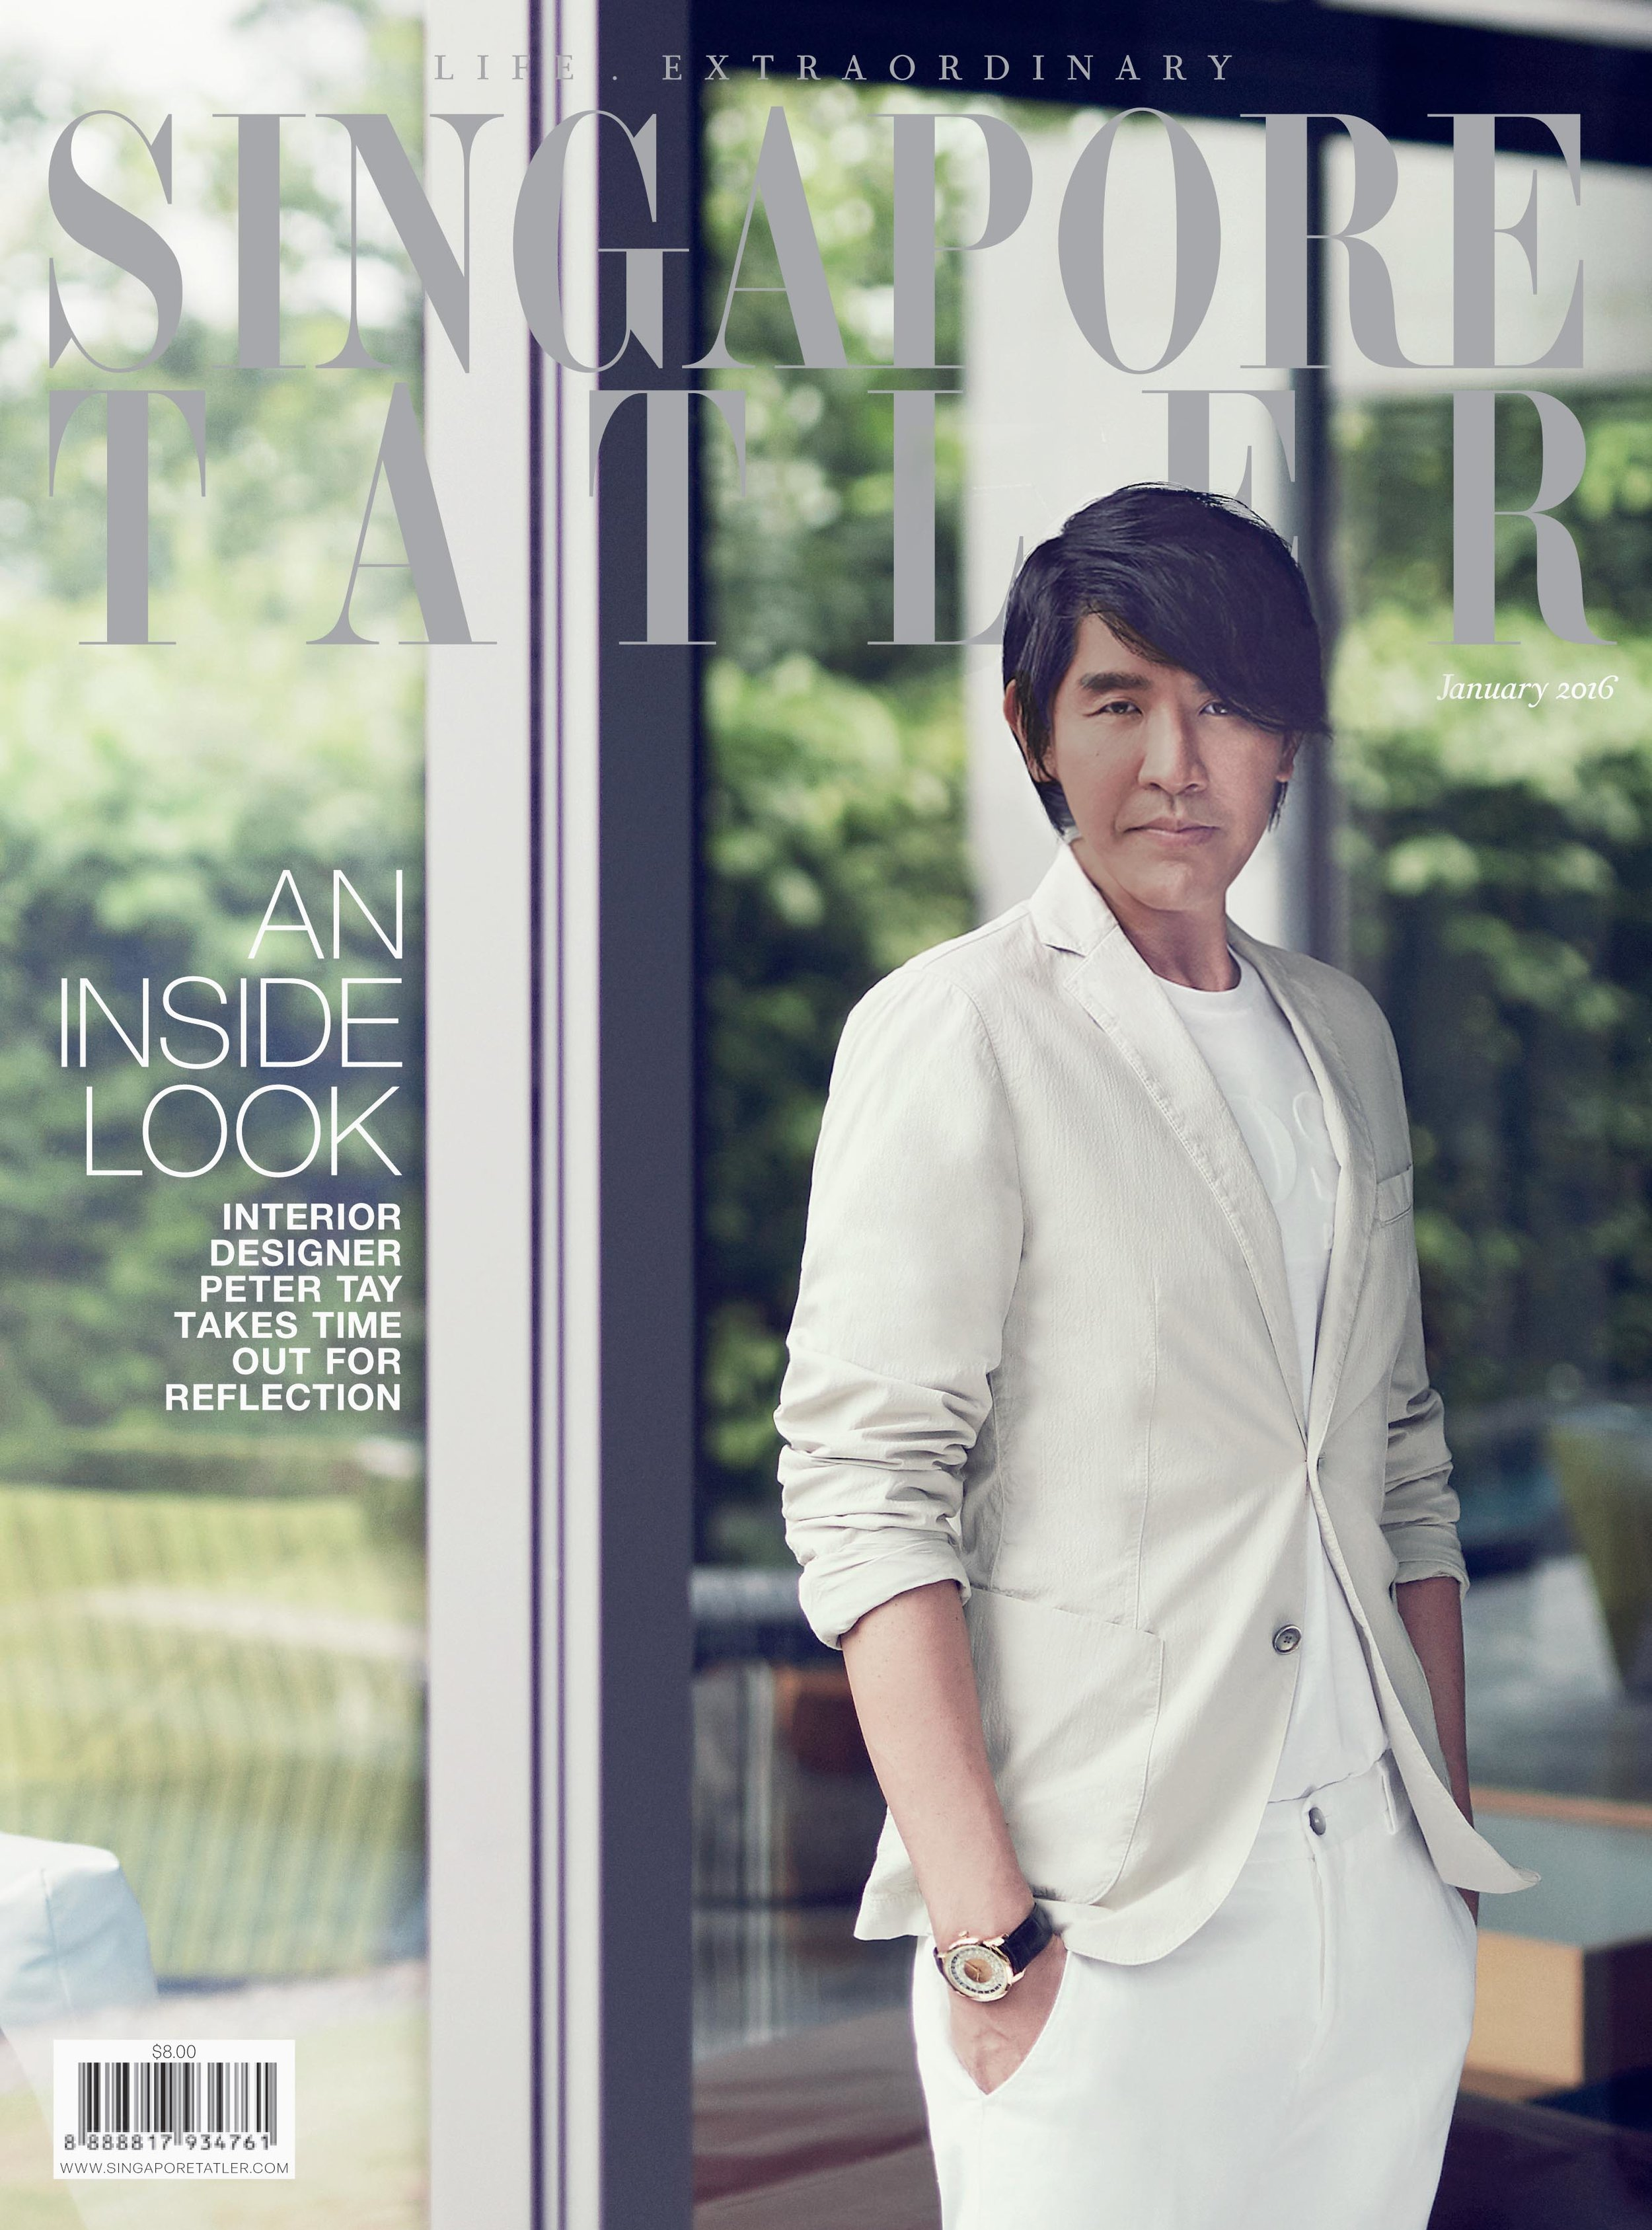 2016, Jan/Singapore Tatler Magazine